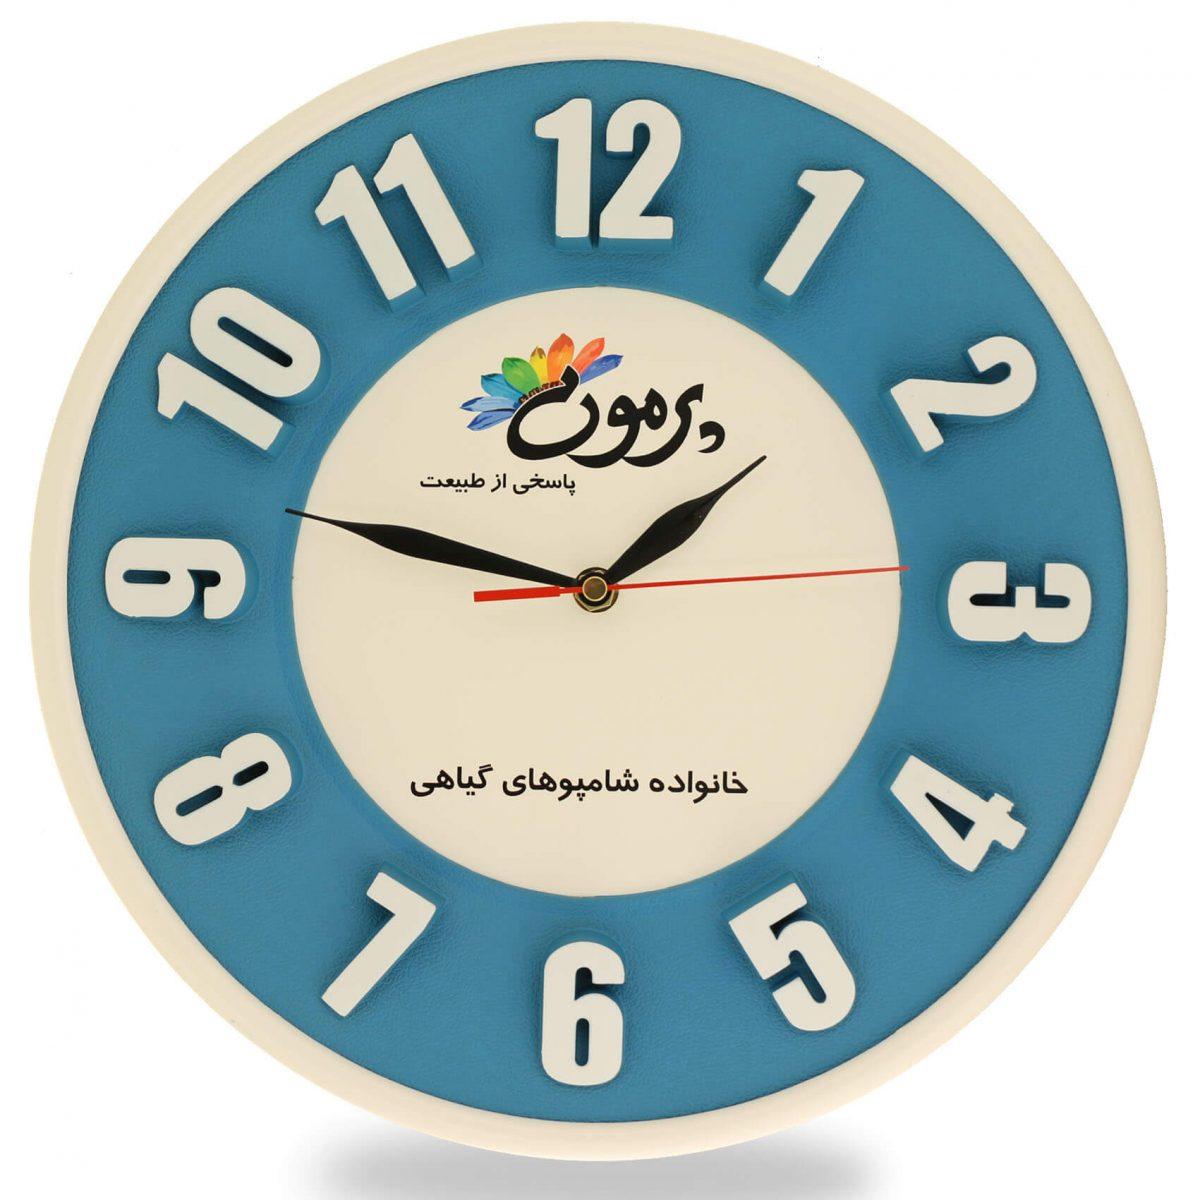 ساعت دیواری مدل 236 1